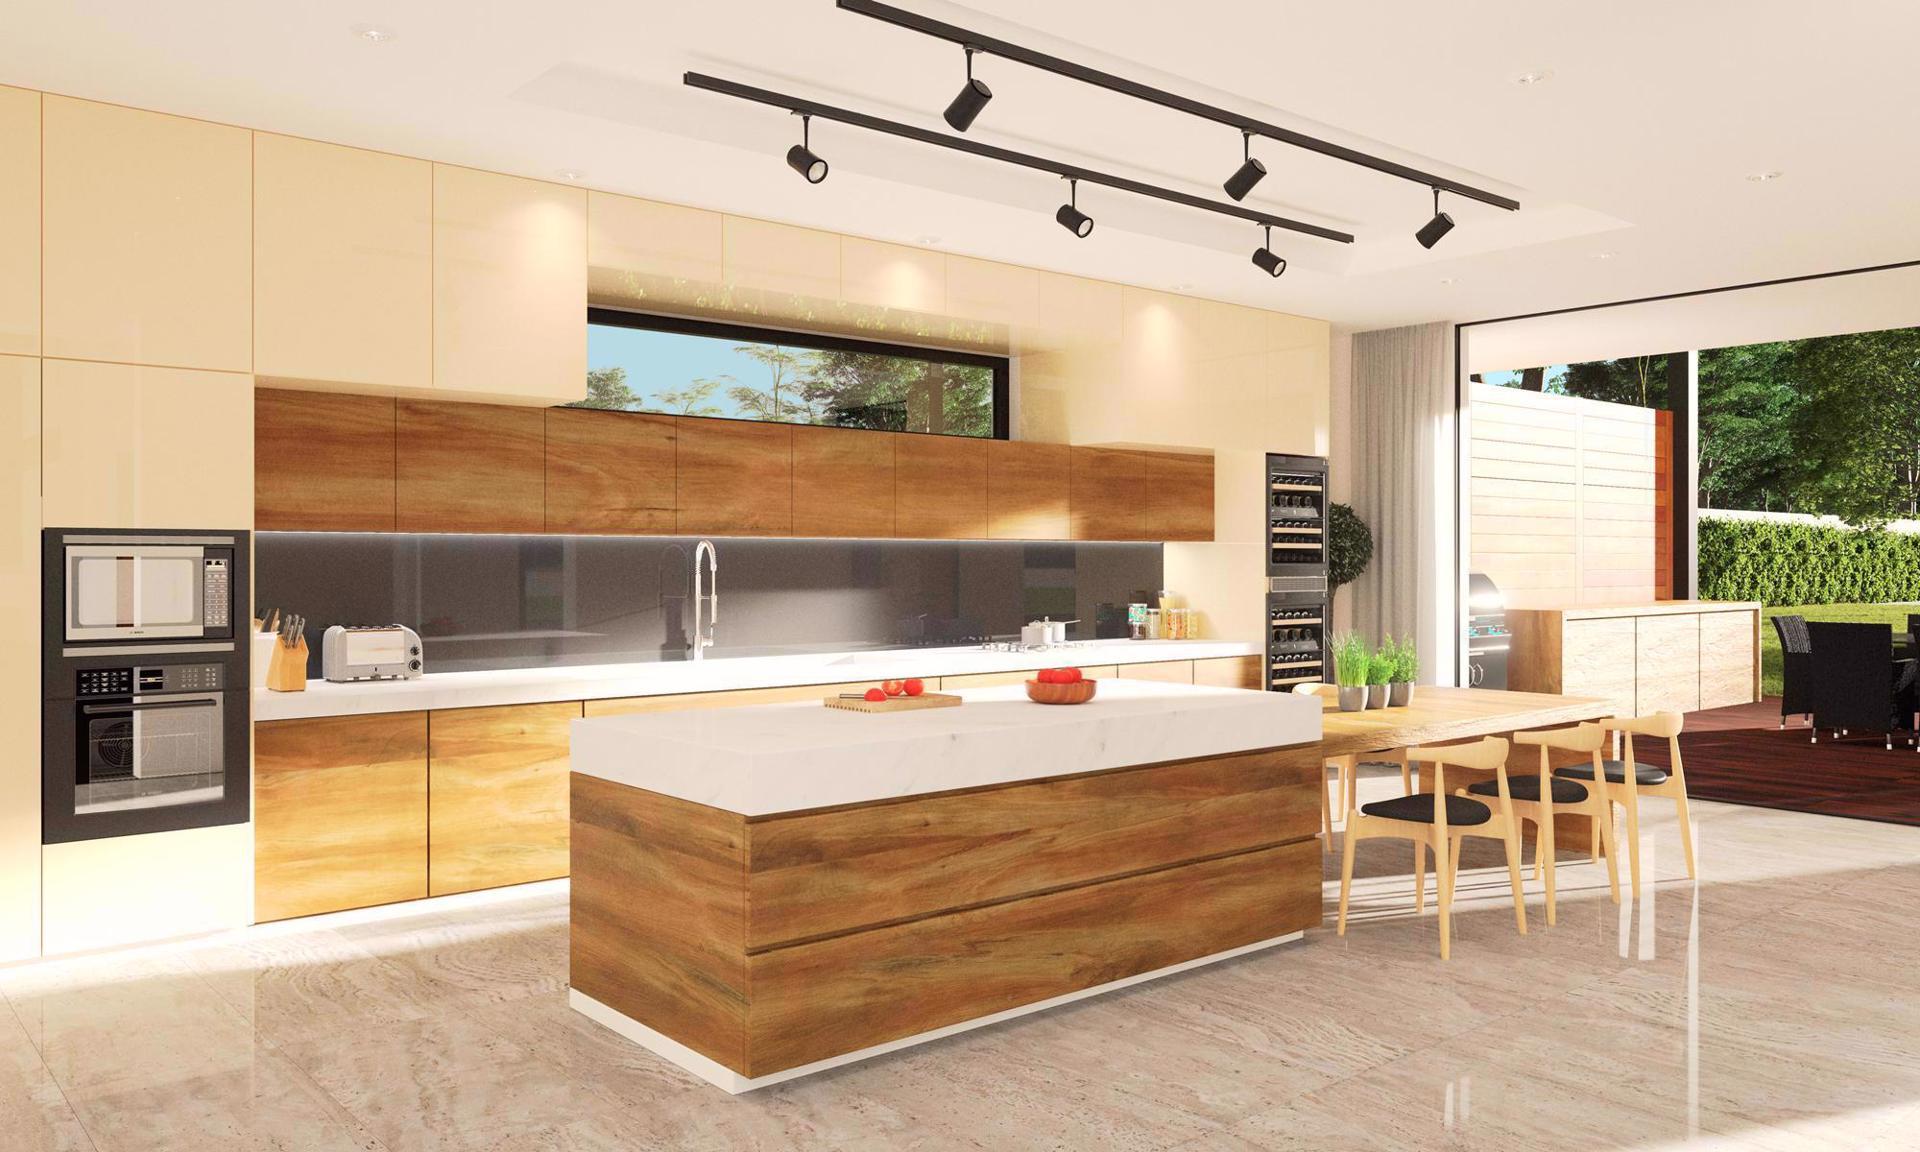 161201_tamarind_cam teracce_kitchen